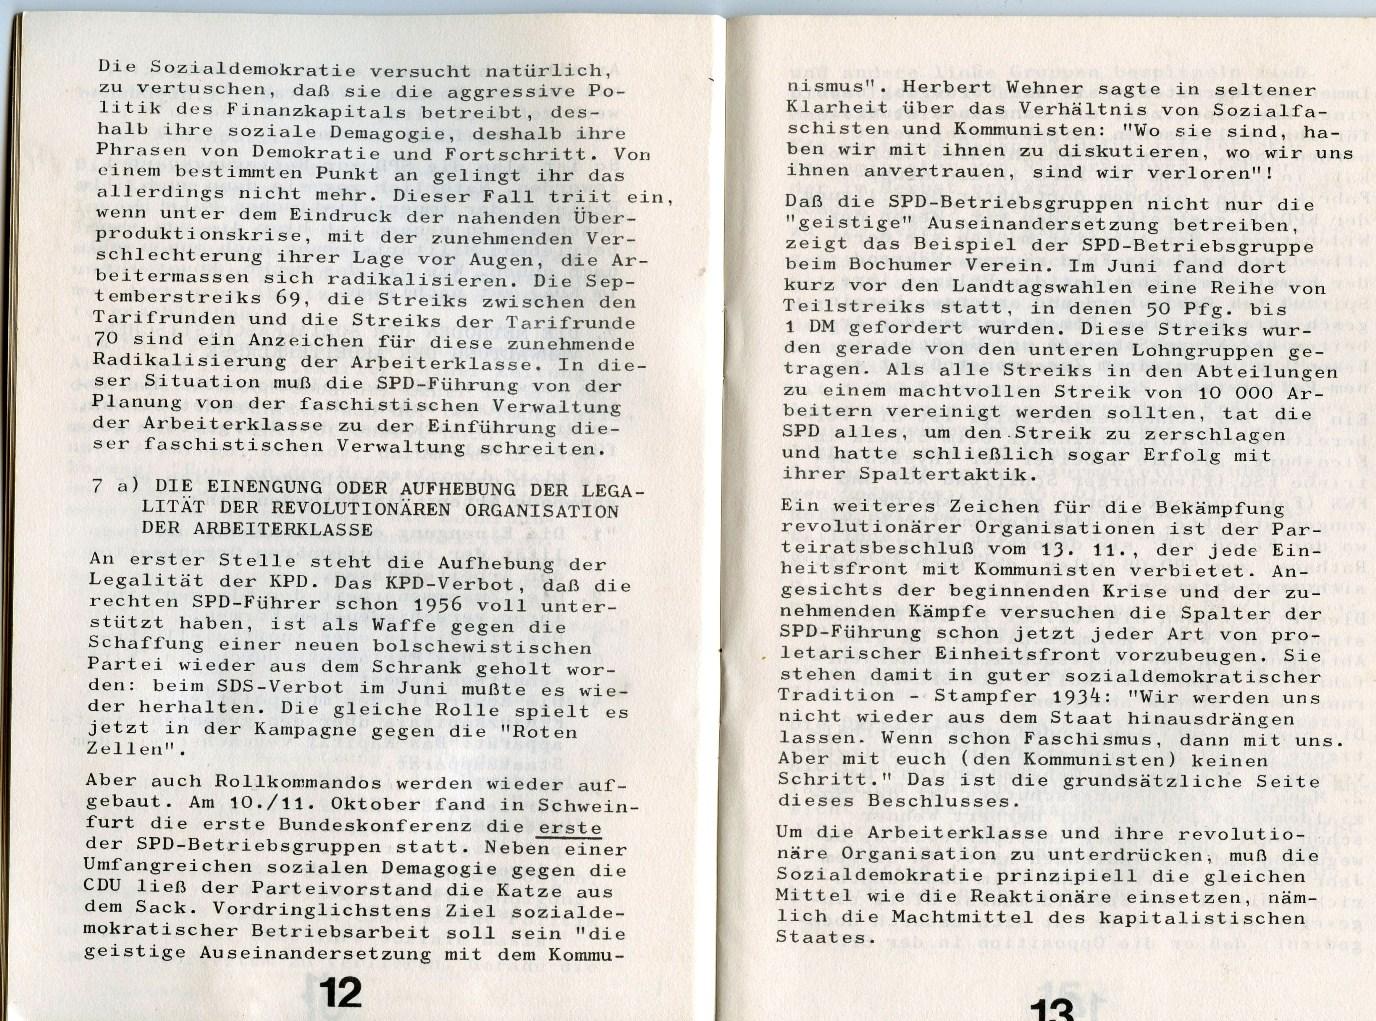 KJVD_Sozialdemokratie_Sozialfaschismus_1971_08